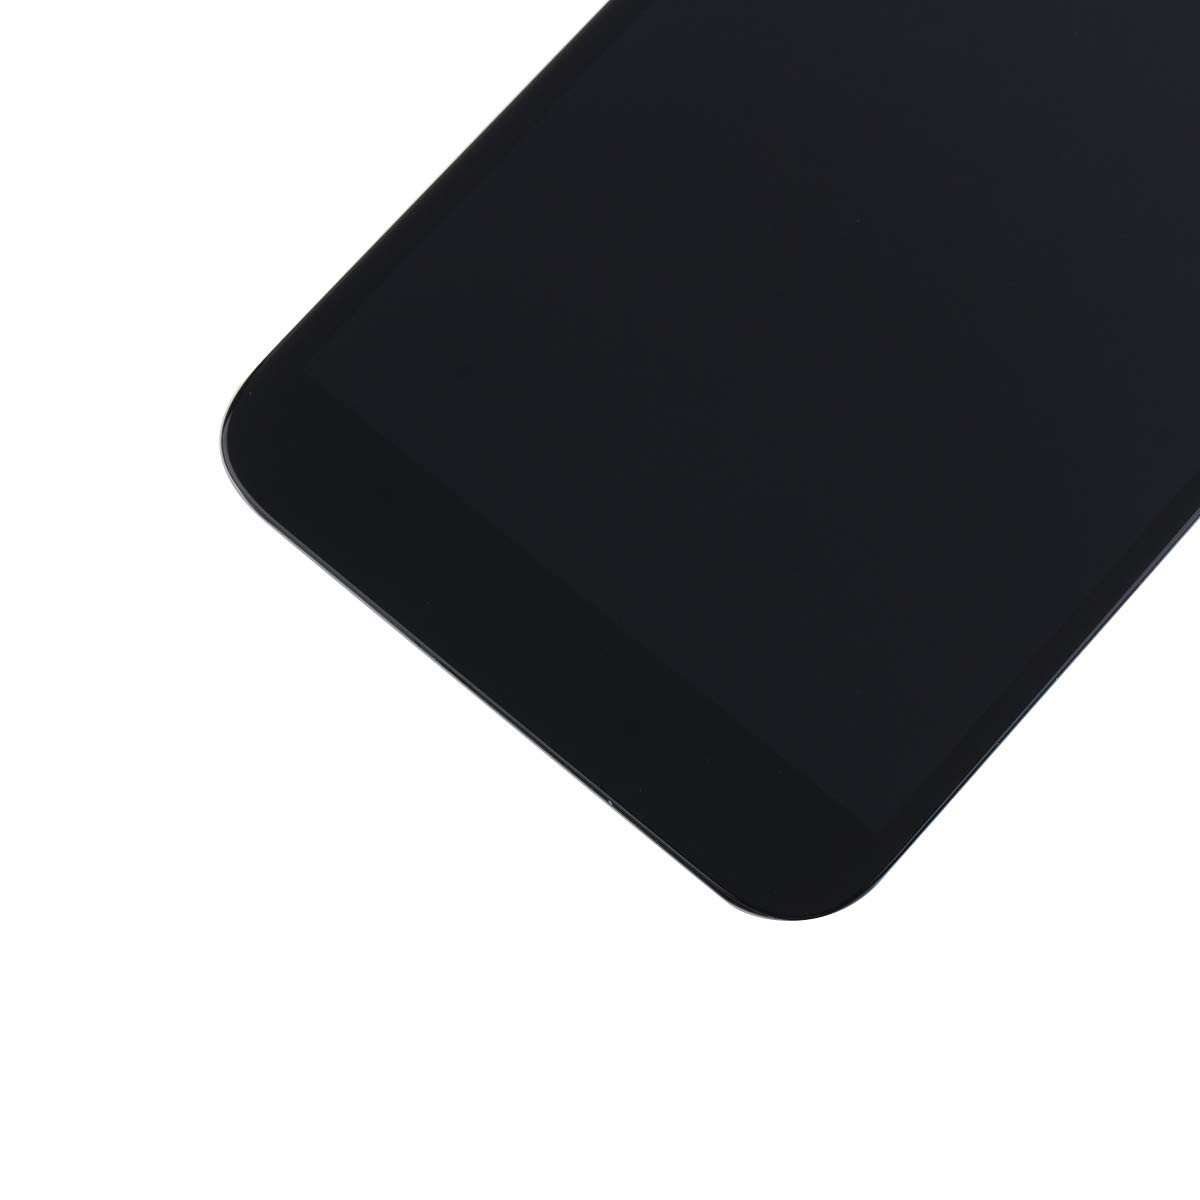 YHX-OU Pantalla LCD de 5,6 Pulgadas para Samsung Galaxy A6 2018 A600 A600F Pantalla de Repuesto con Herramientas Completas Pantalla t/áctil